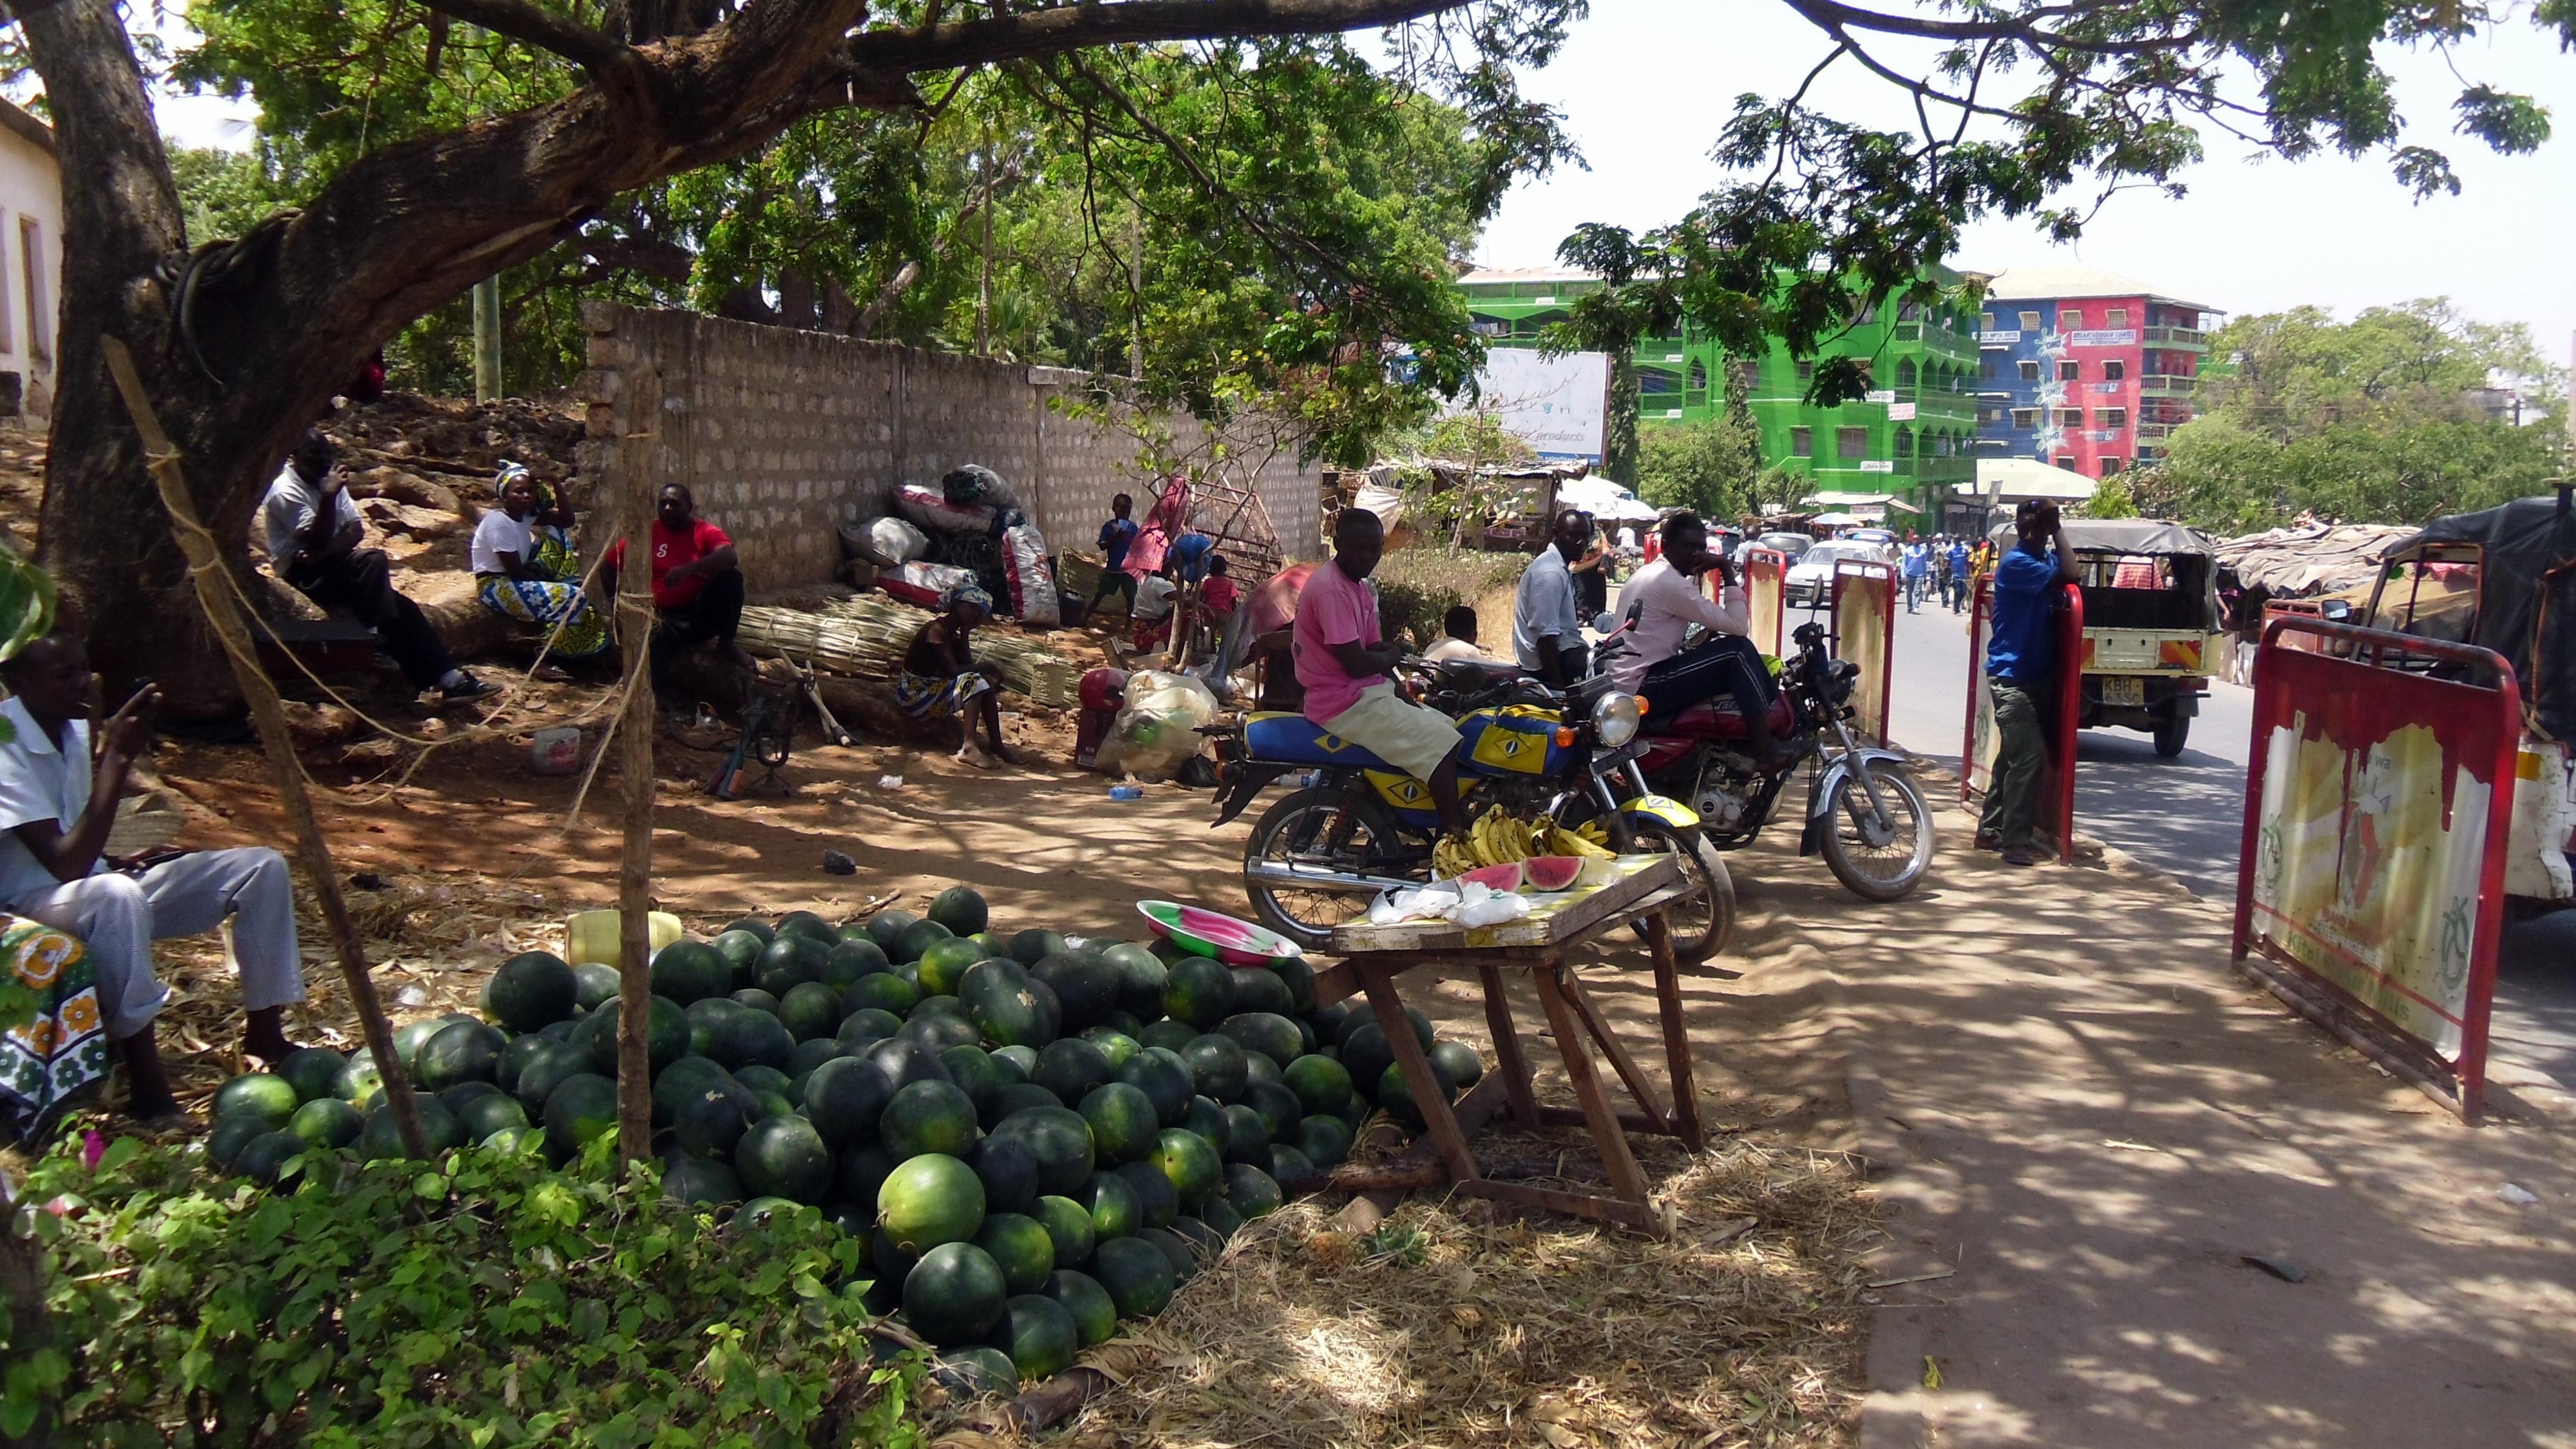 Malindi Kenya Vecchio mercato